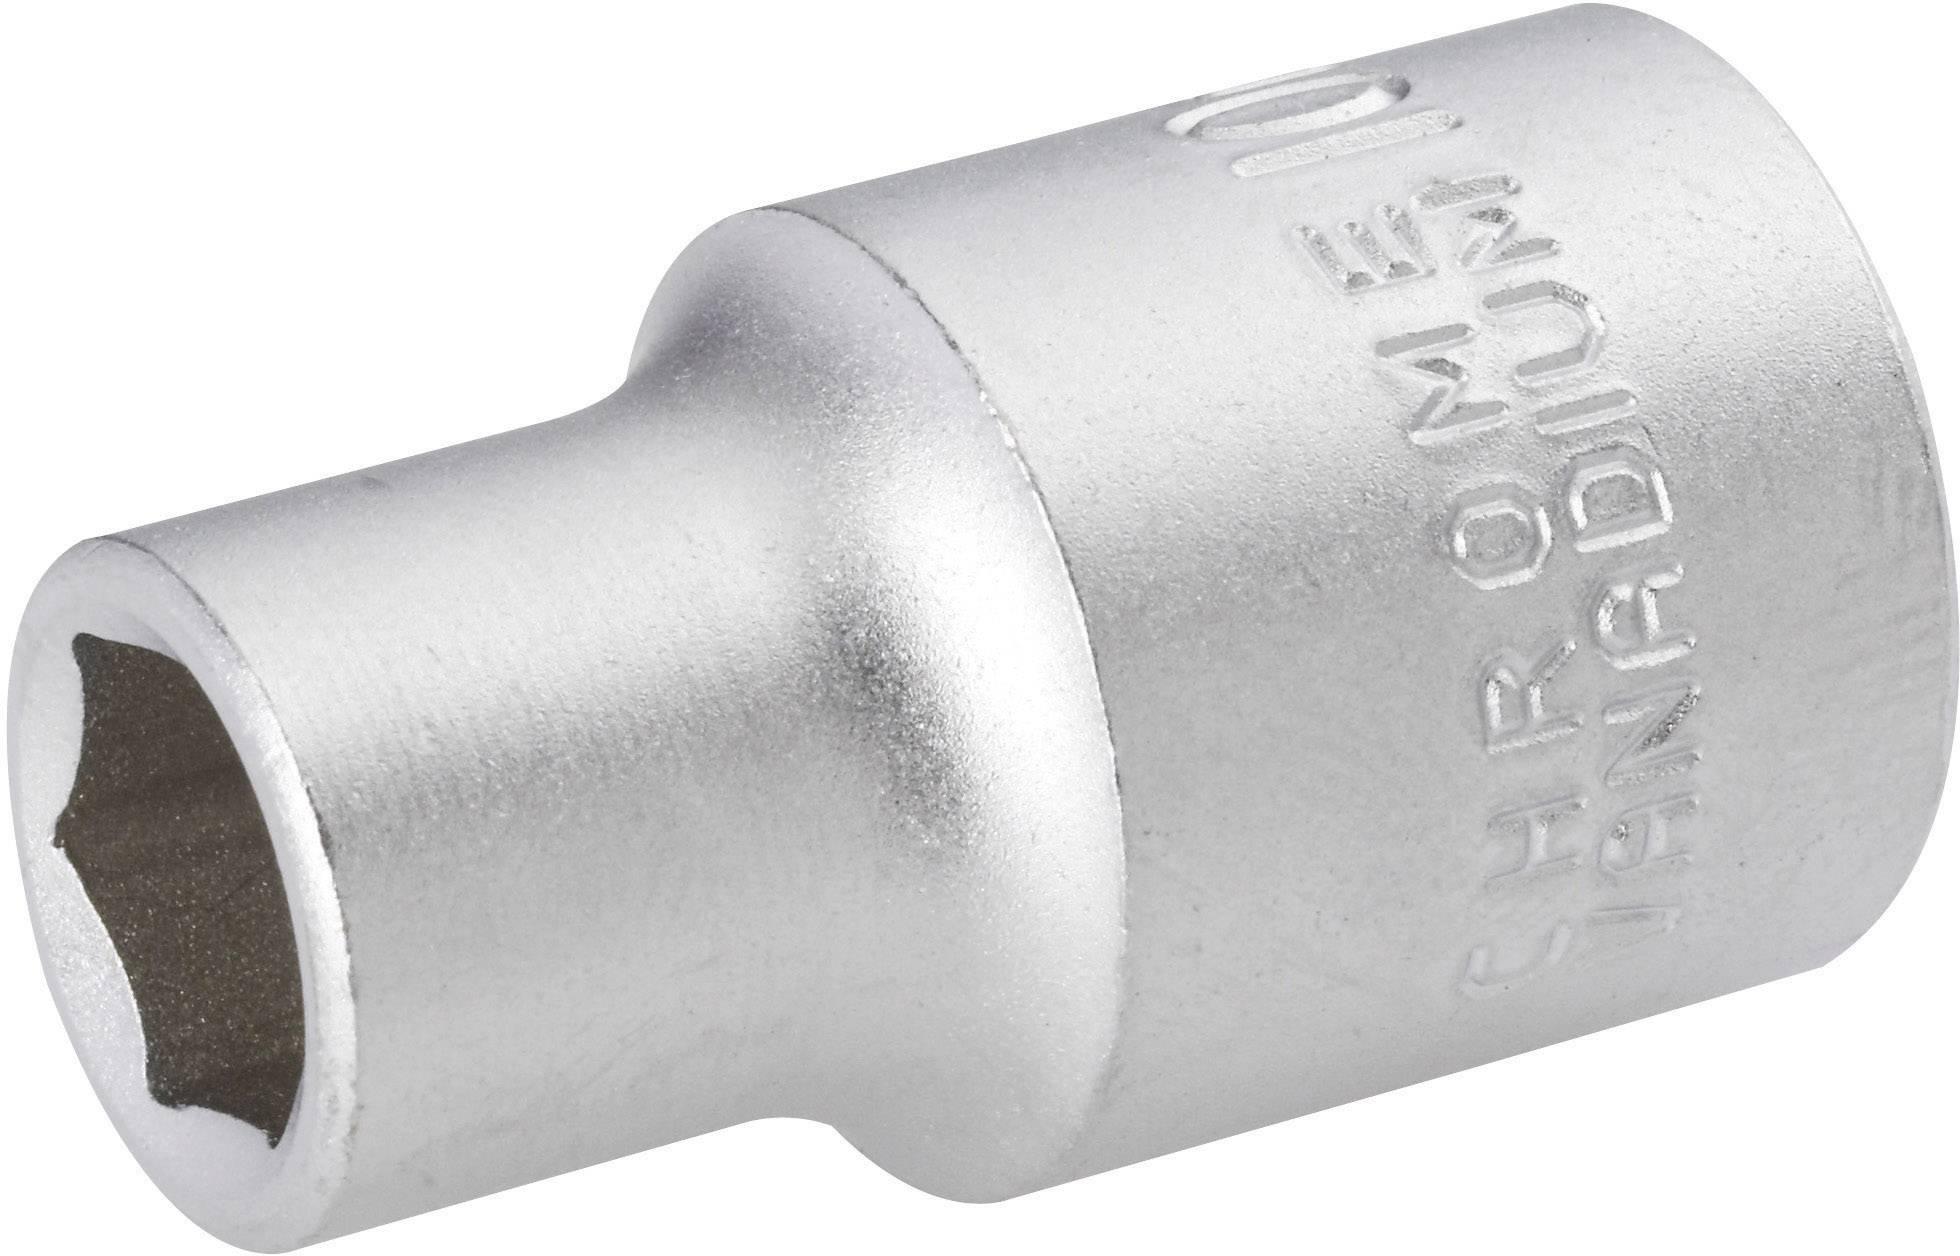 "Nadstavec na račňu TOOLCRAFT 820770, 1/2"" (12.5 mm), 16 mm"